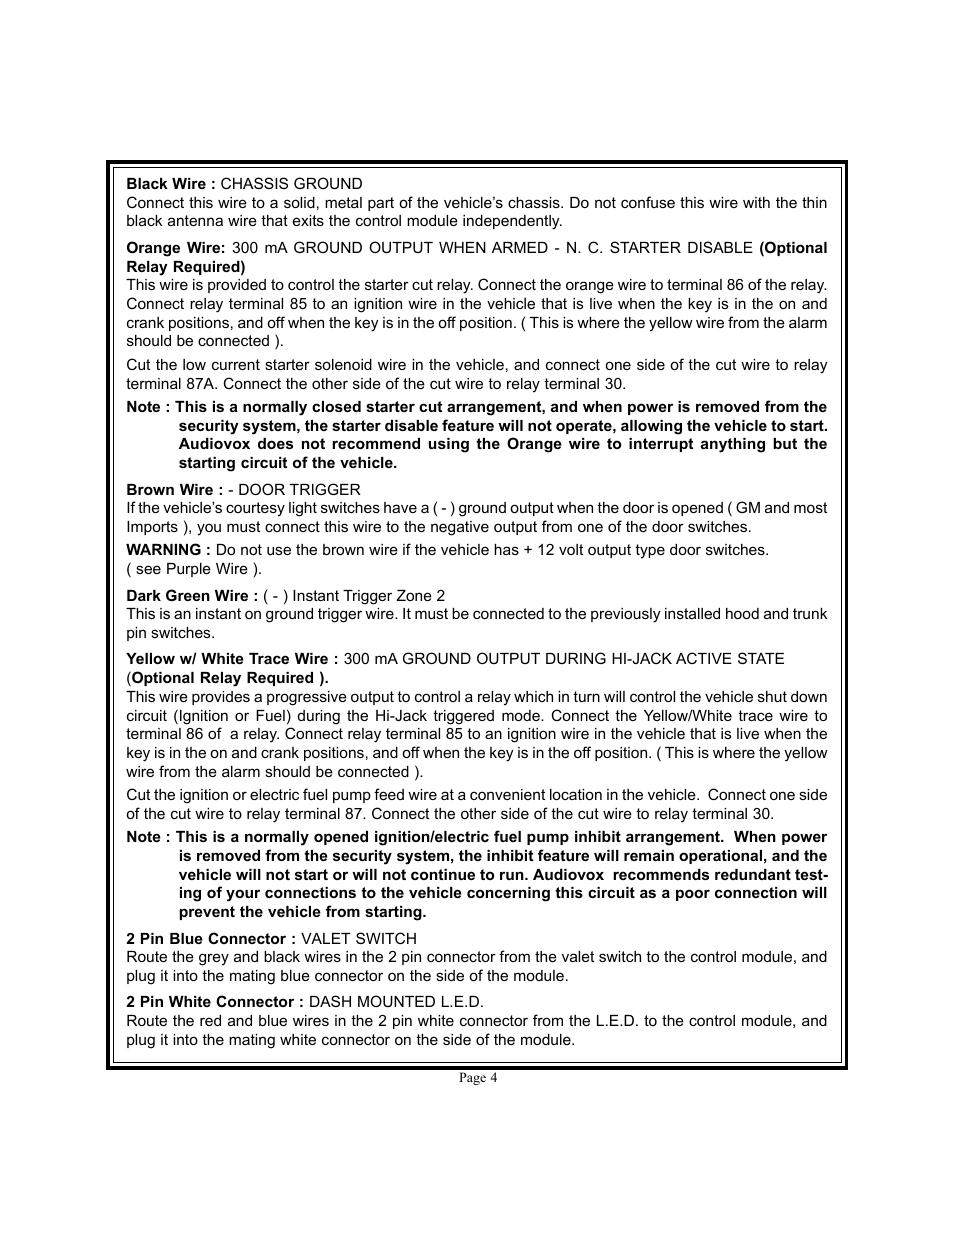 Audiovox User Manual Prestige Wiring Diagram Aps 25hj Page 4 12 Original Mode Rh Manualsdir Com Aps25e Walkie Talkie